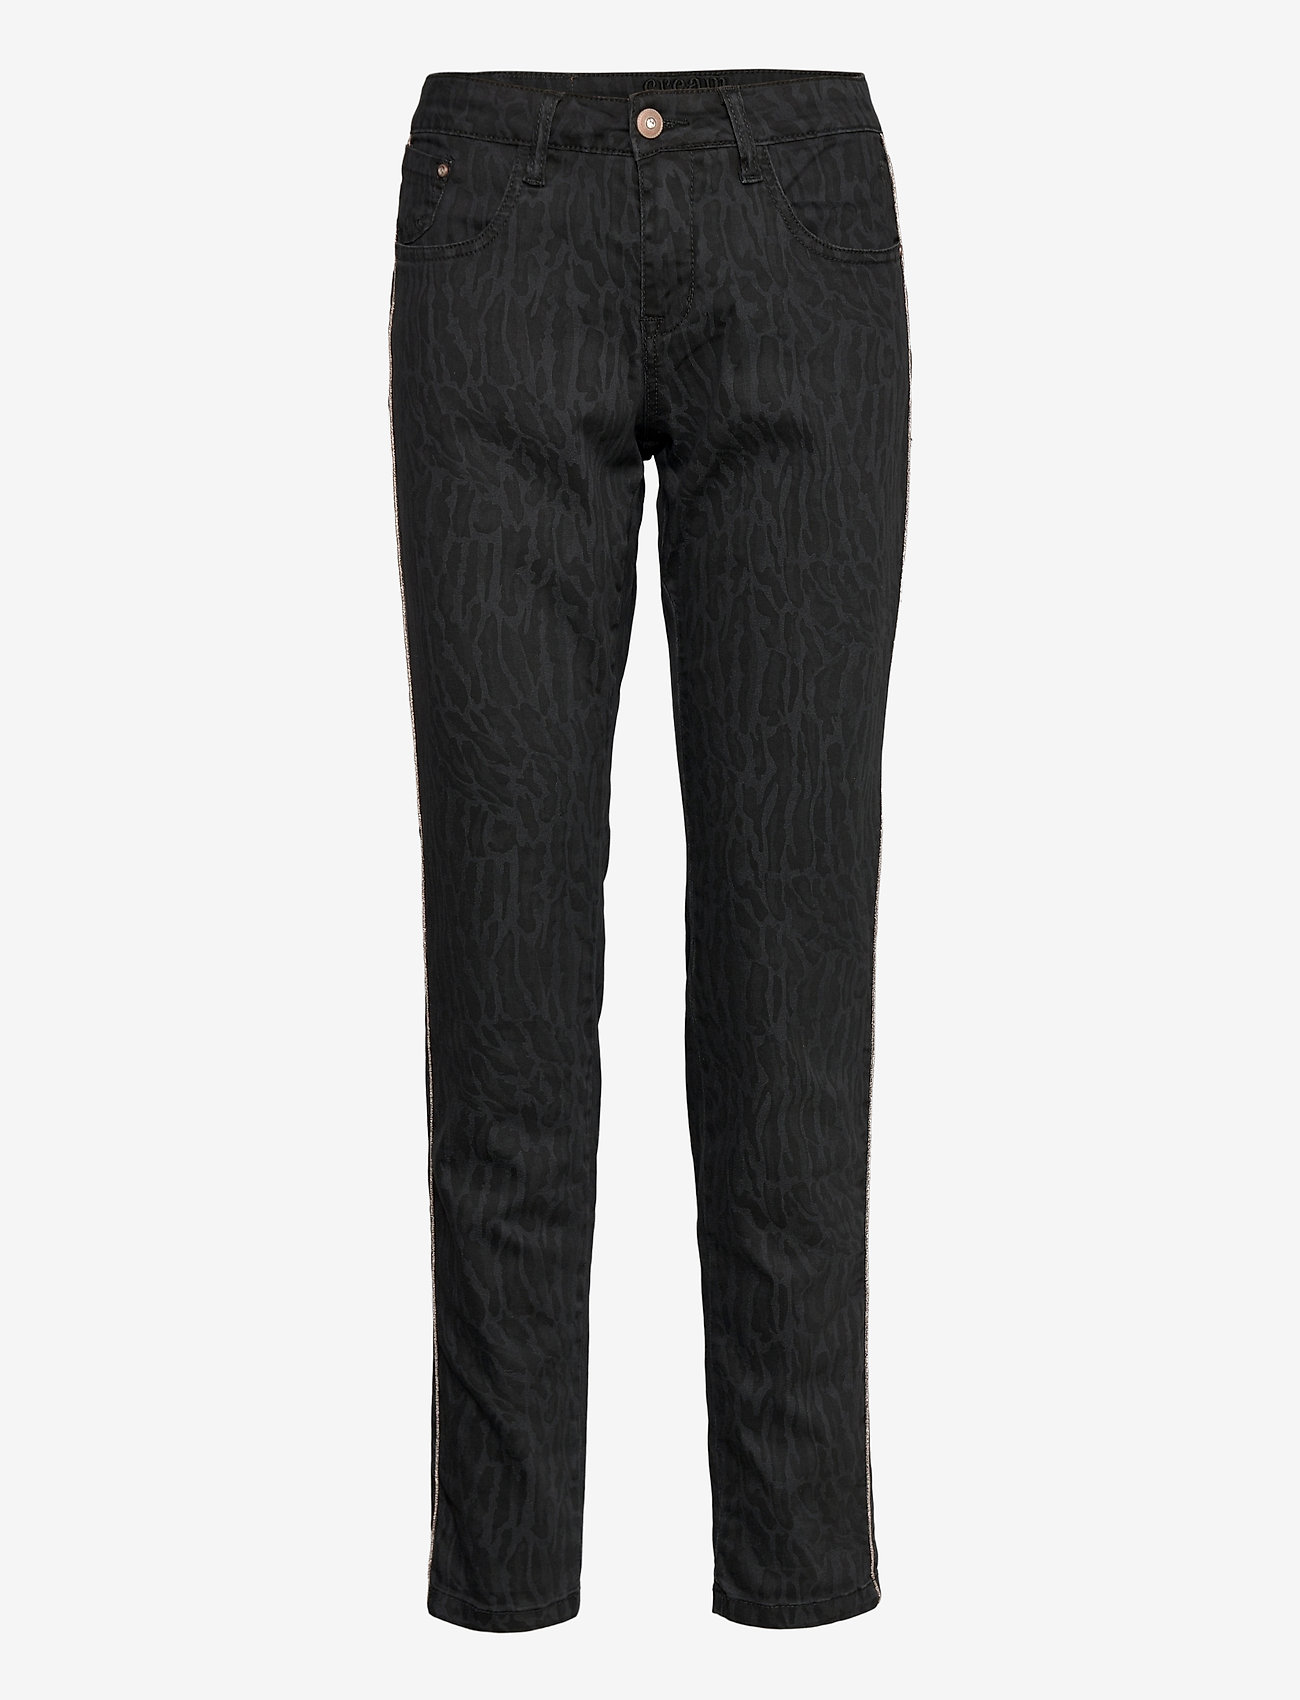 Cream - LotteCR Printed Twill Pants - Coco - slim jeans - grey toned tiger - 0